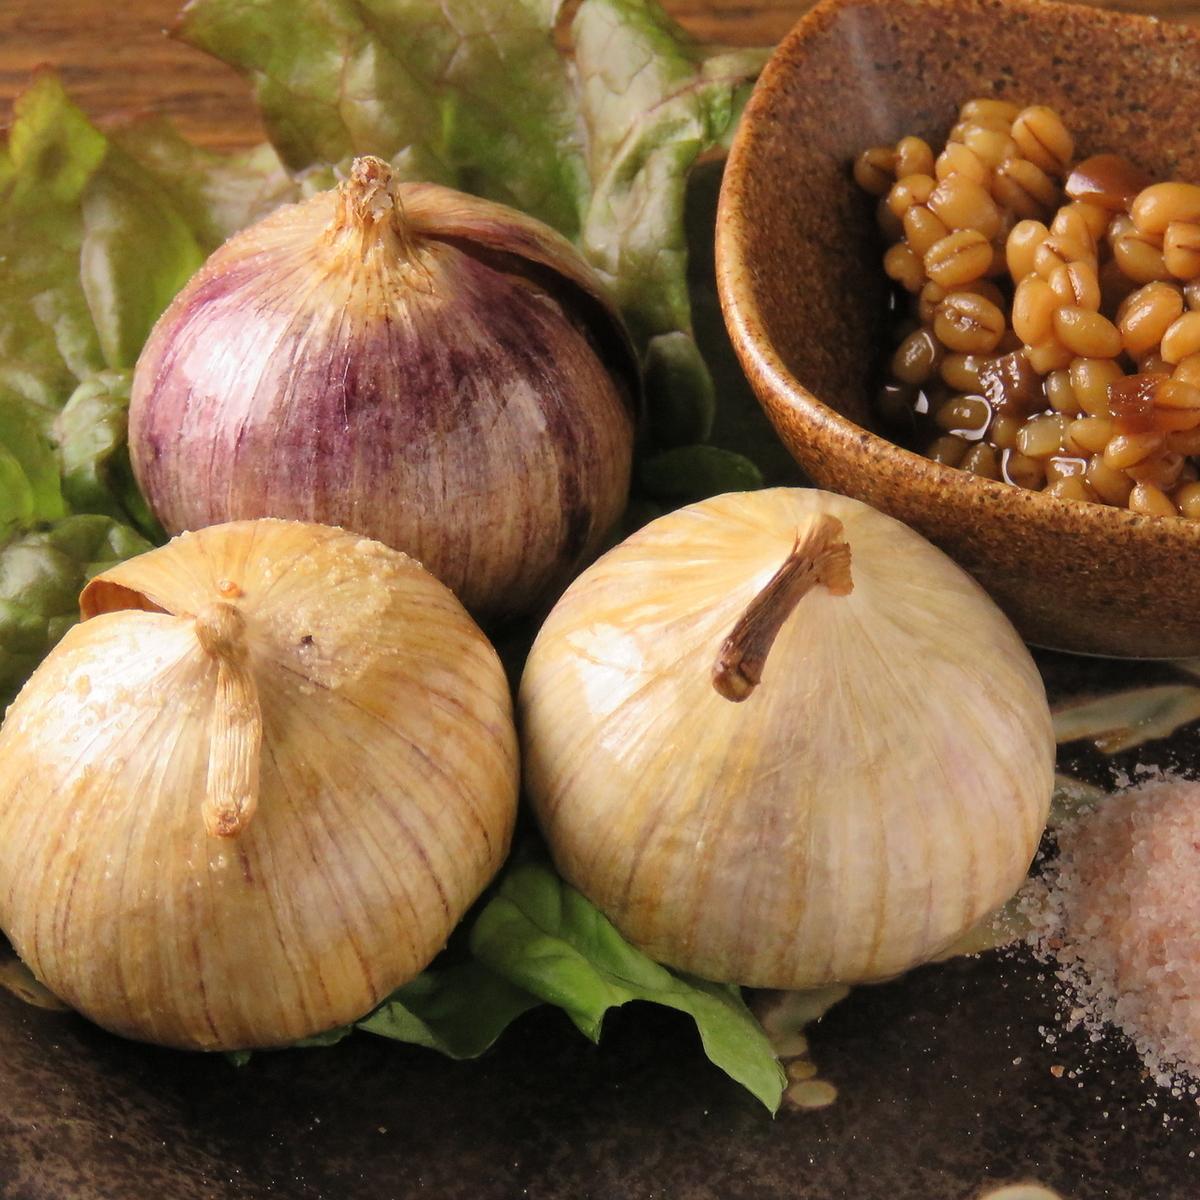 Dumpling garlic